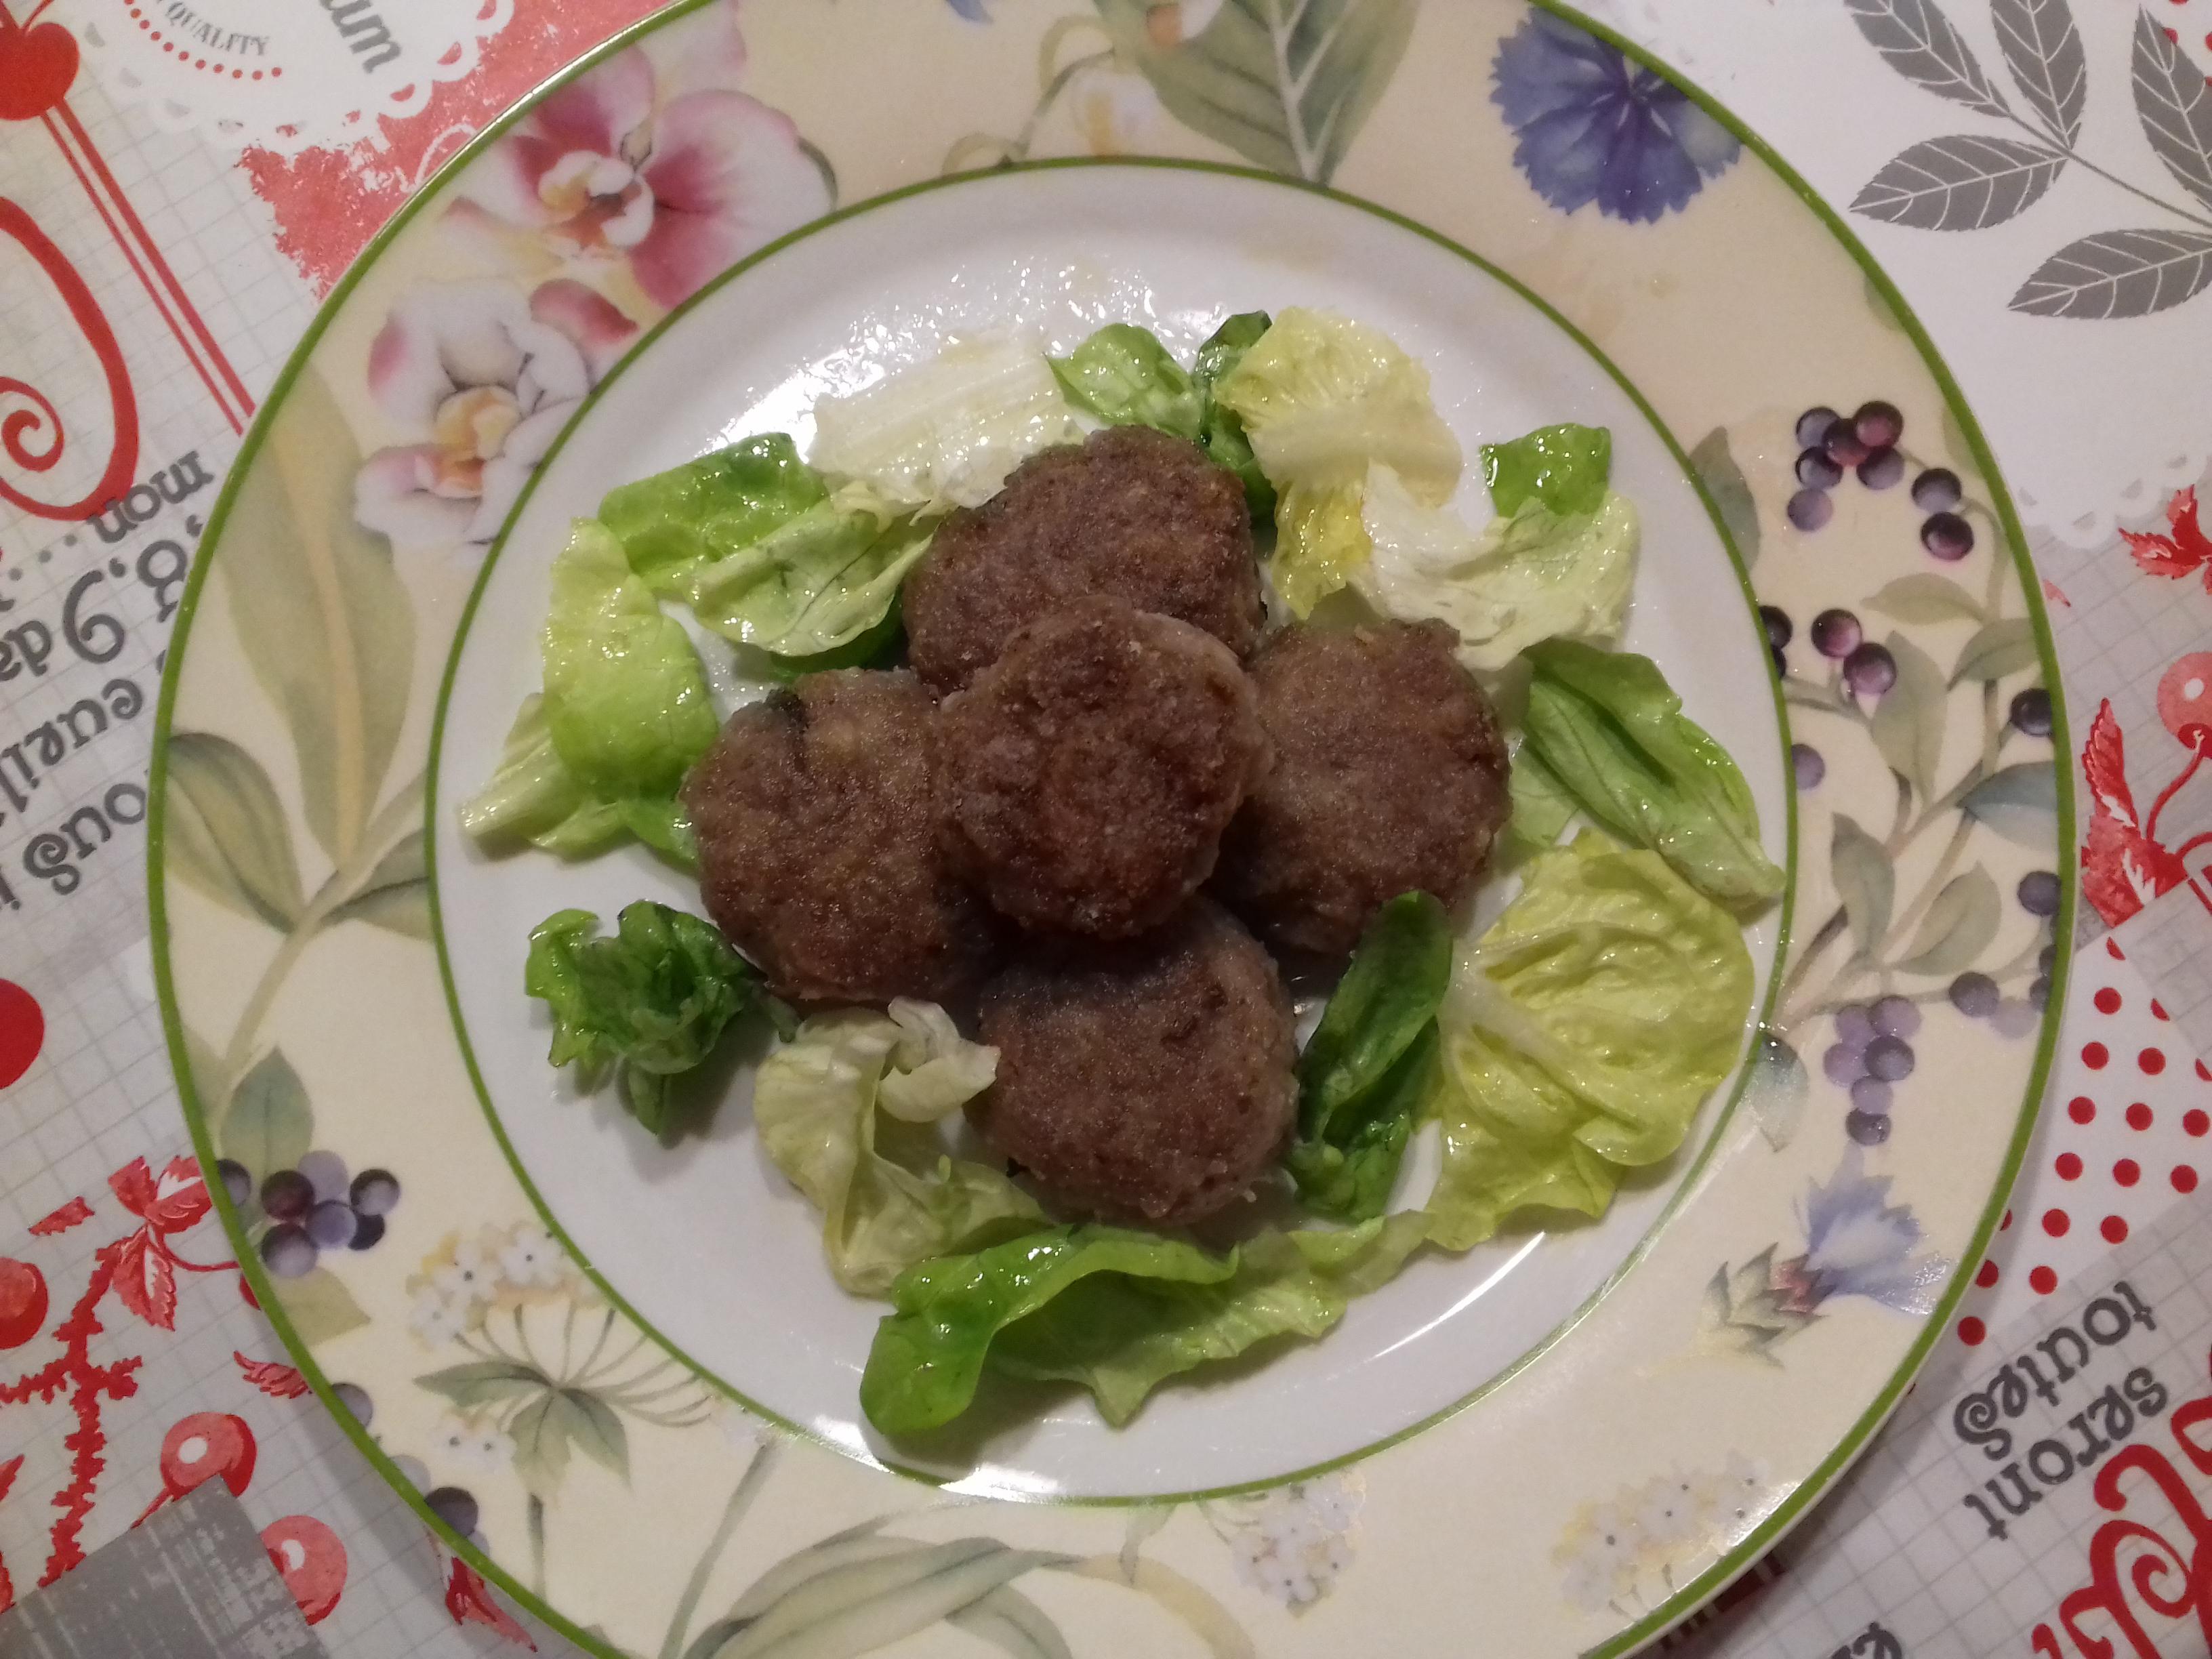 Polpettine di carne e melanzane senza glutine